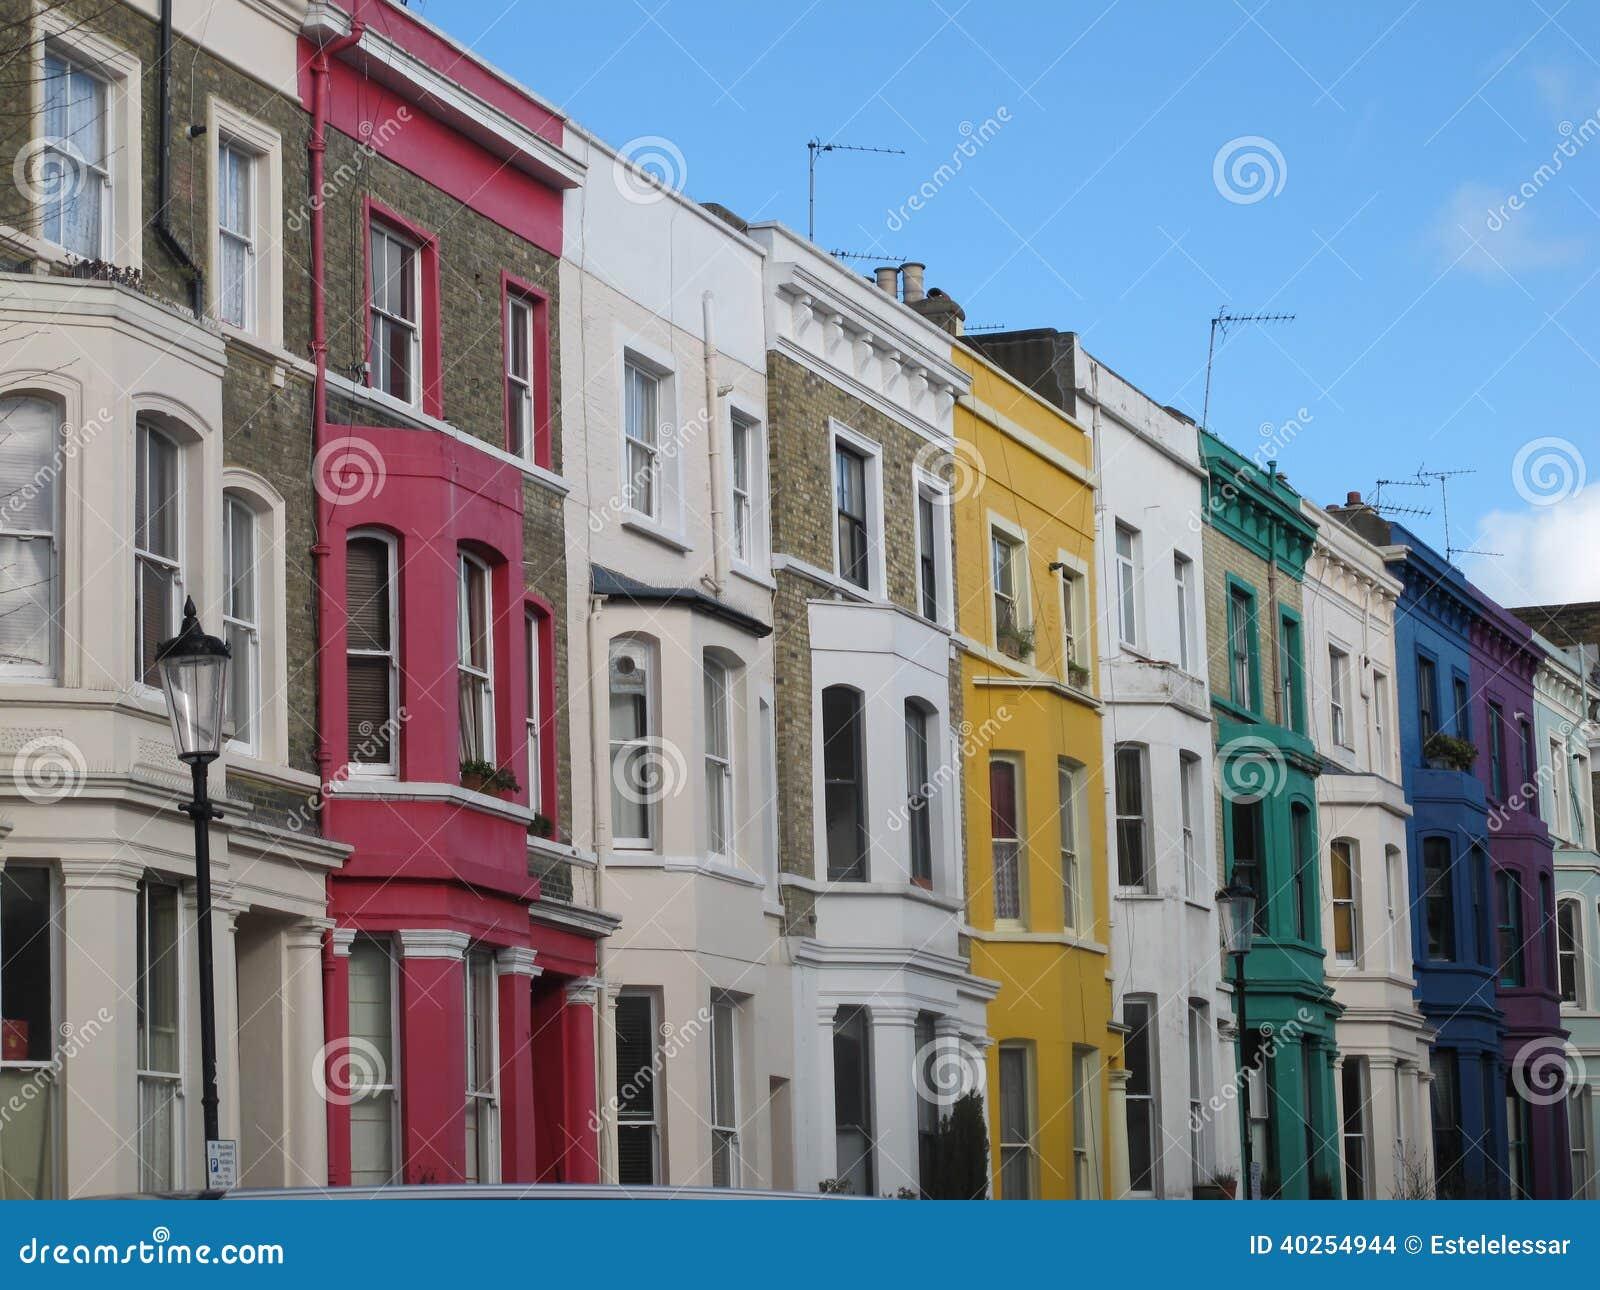 bunte h user nahe portobello stra e london england stockfoto bild 40254944. Black Bedroom Furniture Sets. Home Design Ideas